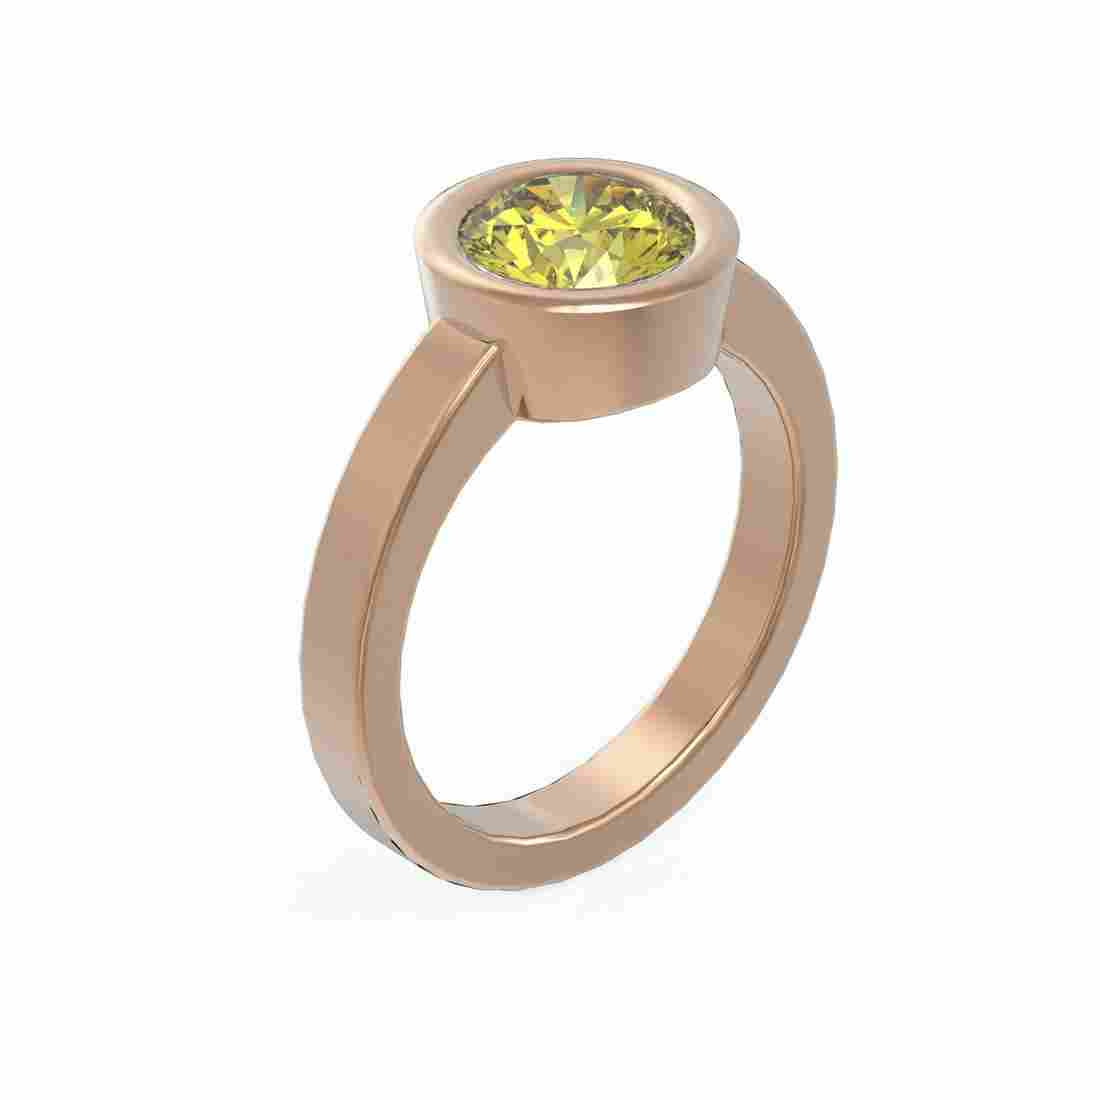 1.5 ctw Fancy Yellow Diamond Ring 18K Rose Gold -